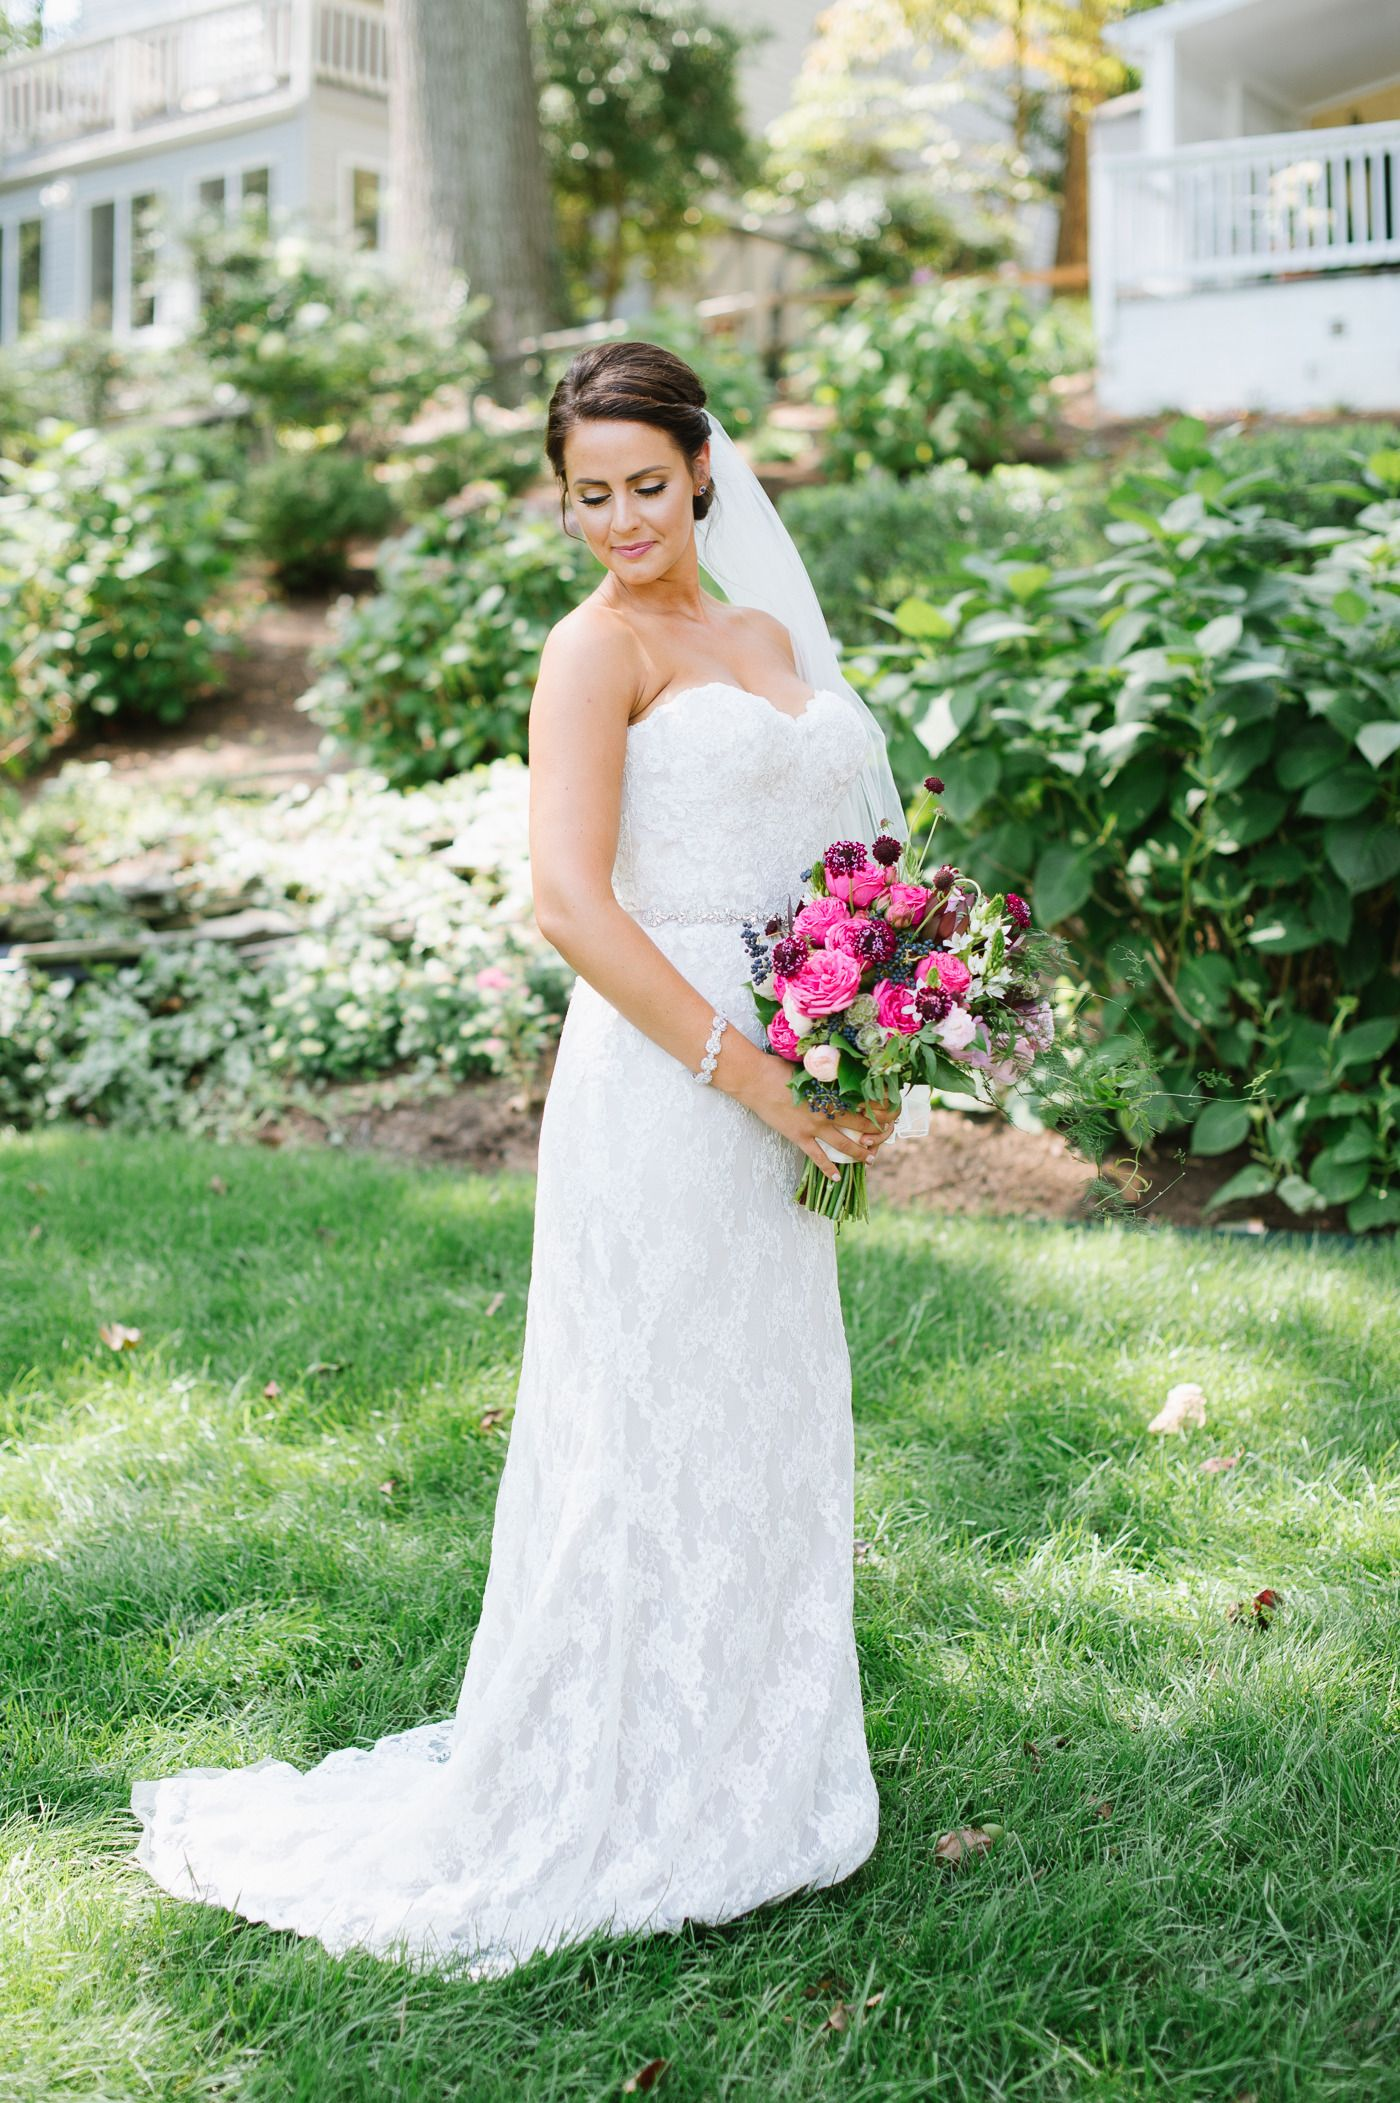 20 Stunning Semi-naked Wedding Cakes   SouthBound Bride